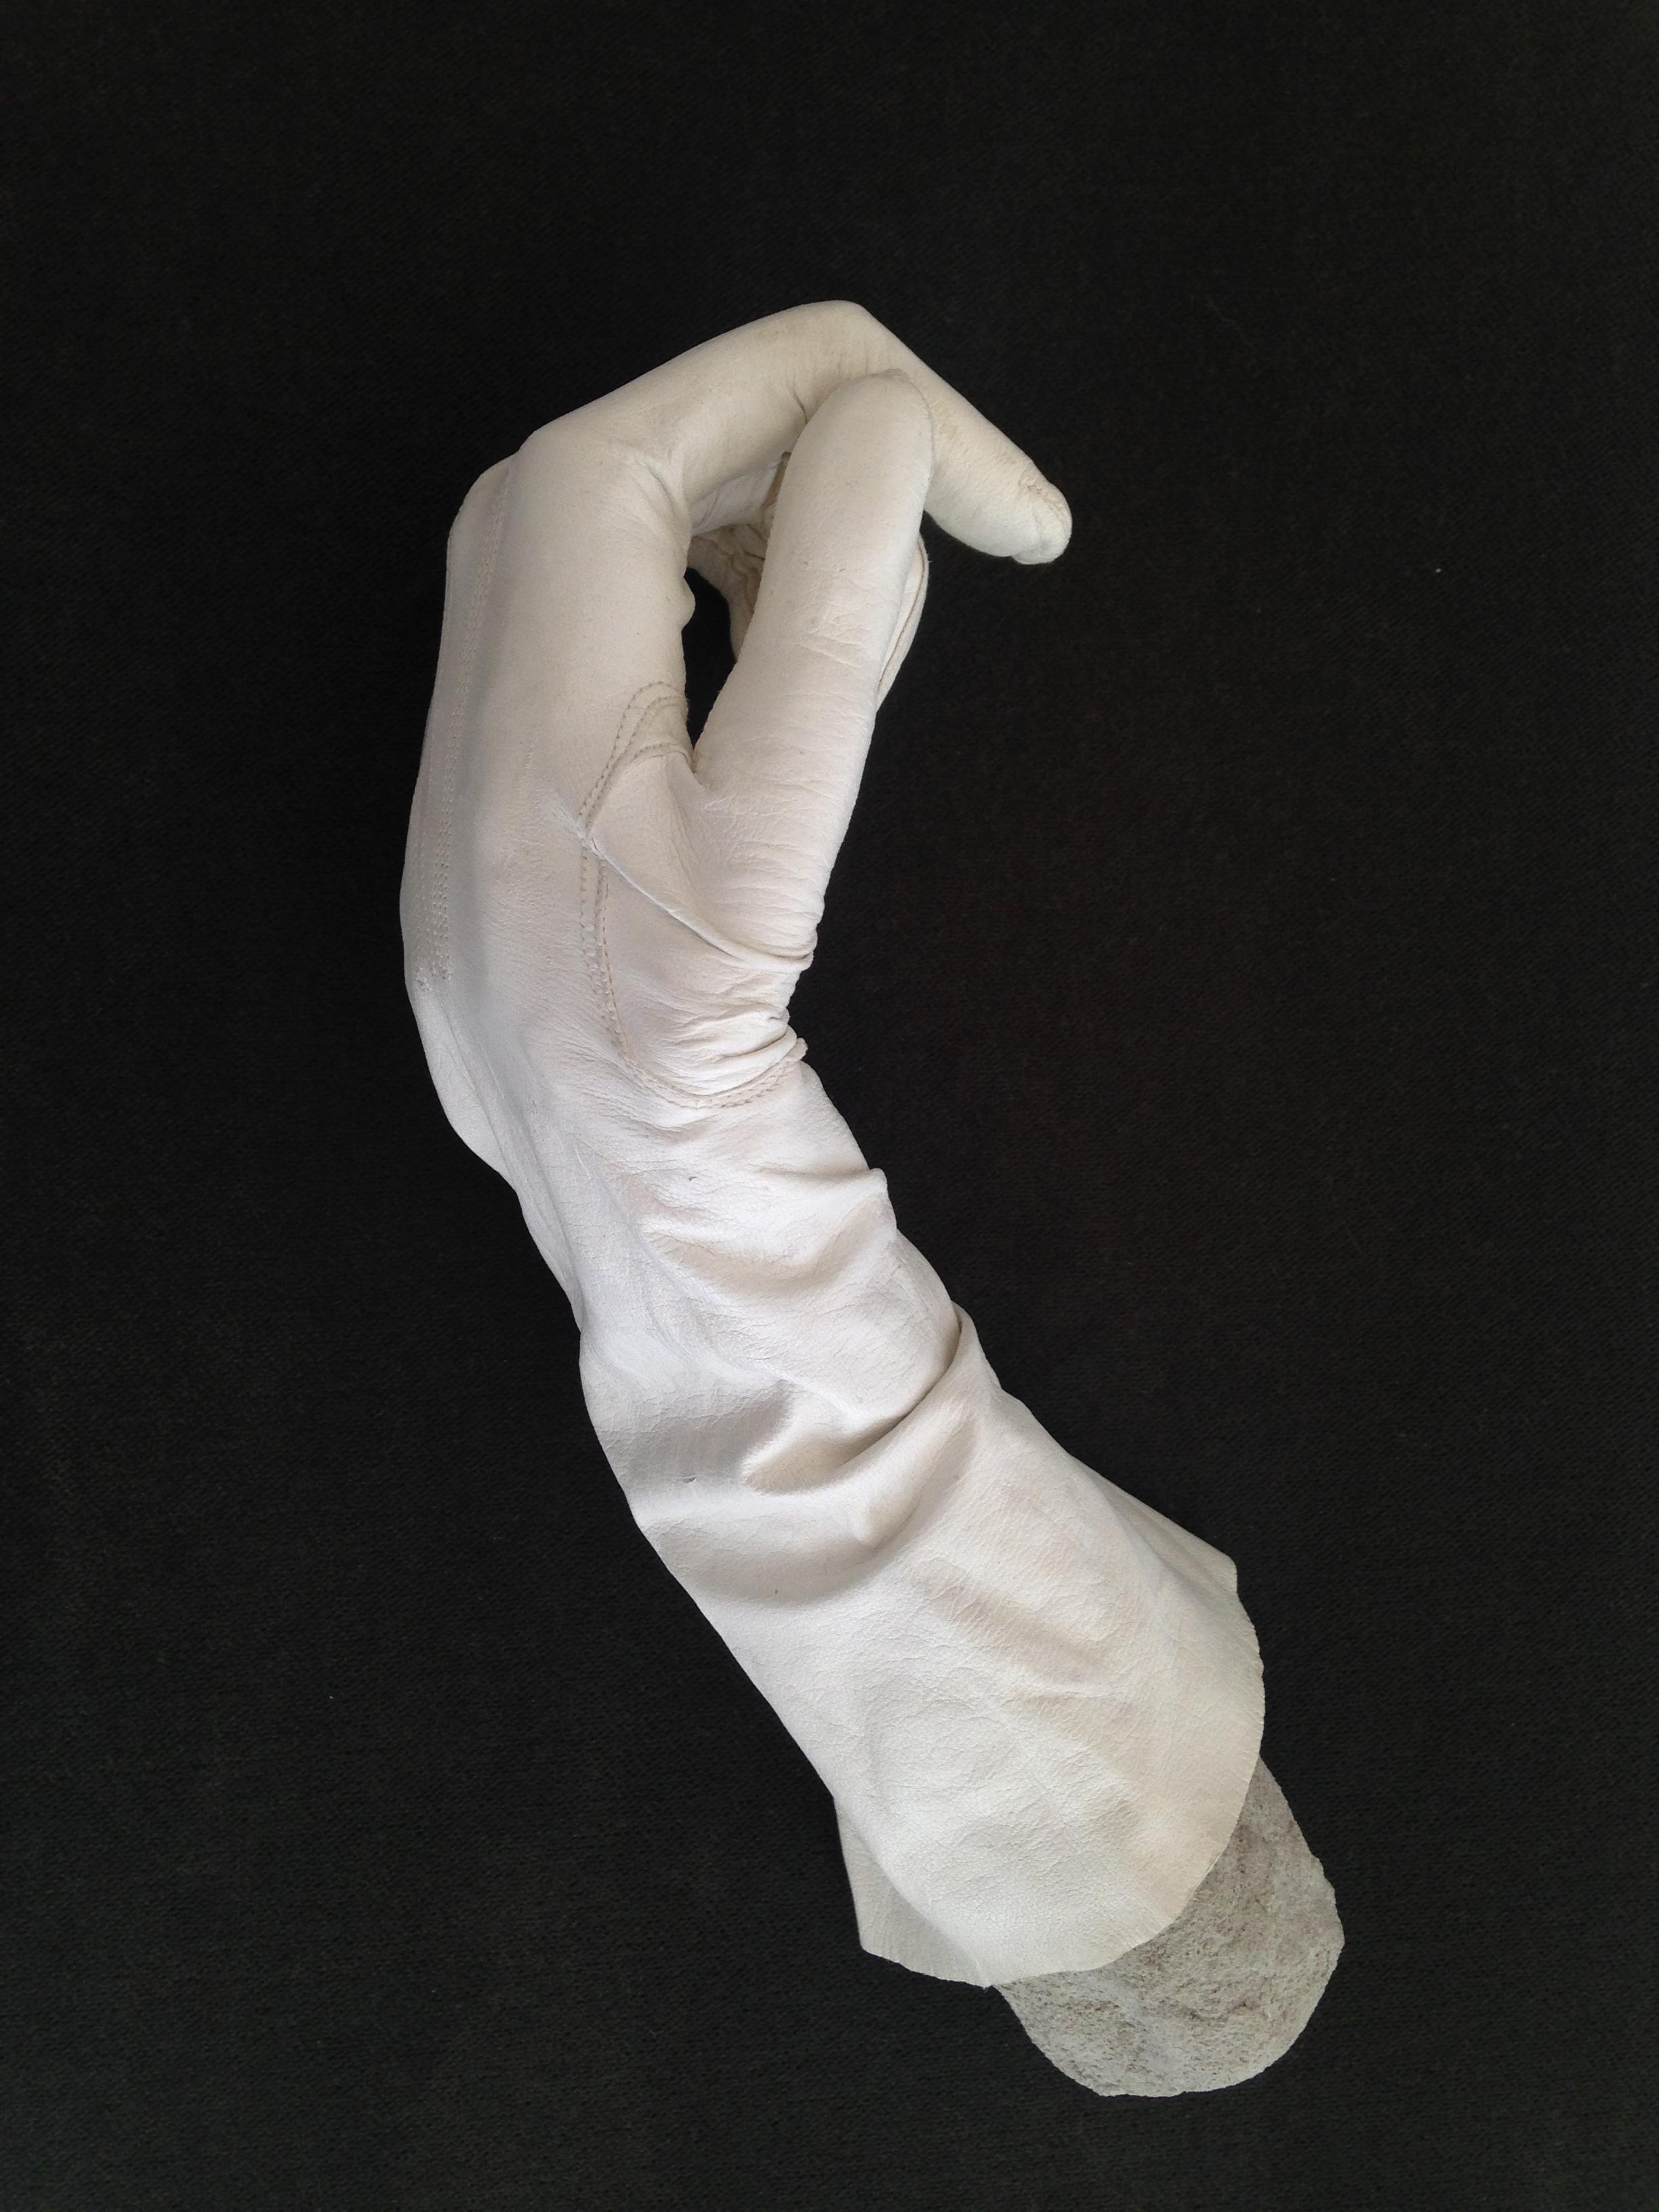 AM, Hllda Doolittle, Man Ray, The Hand and the Glove.jpg